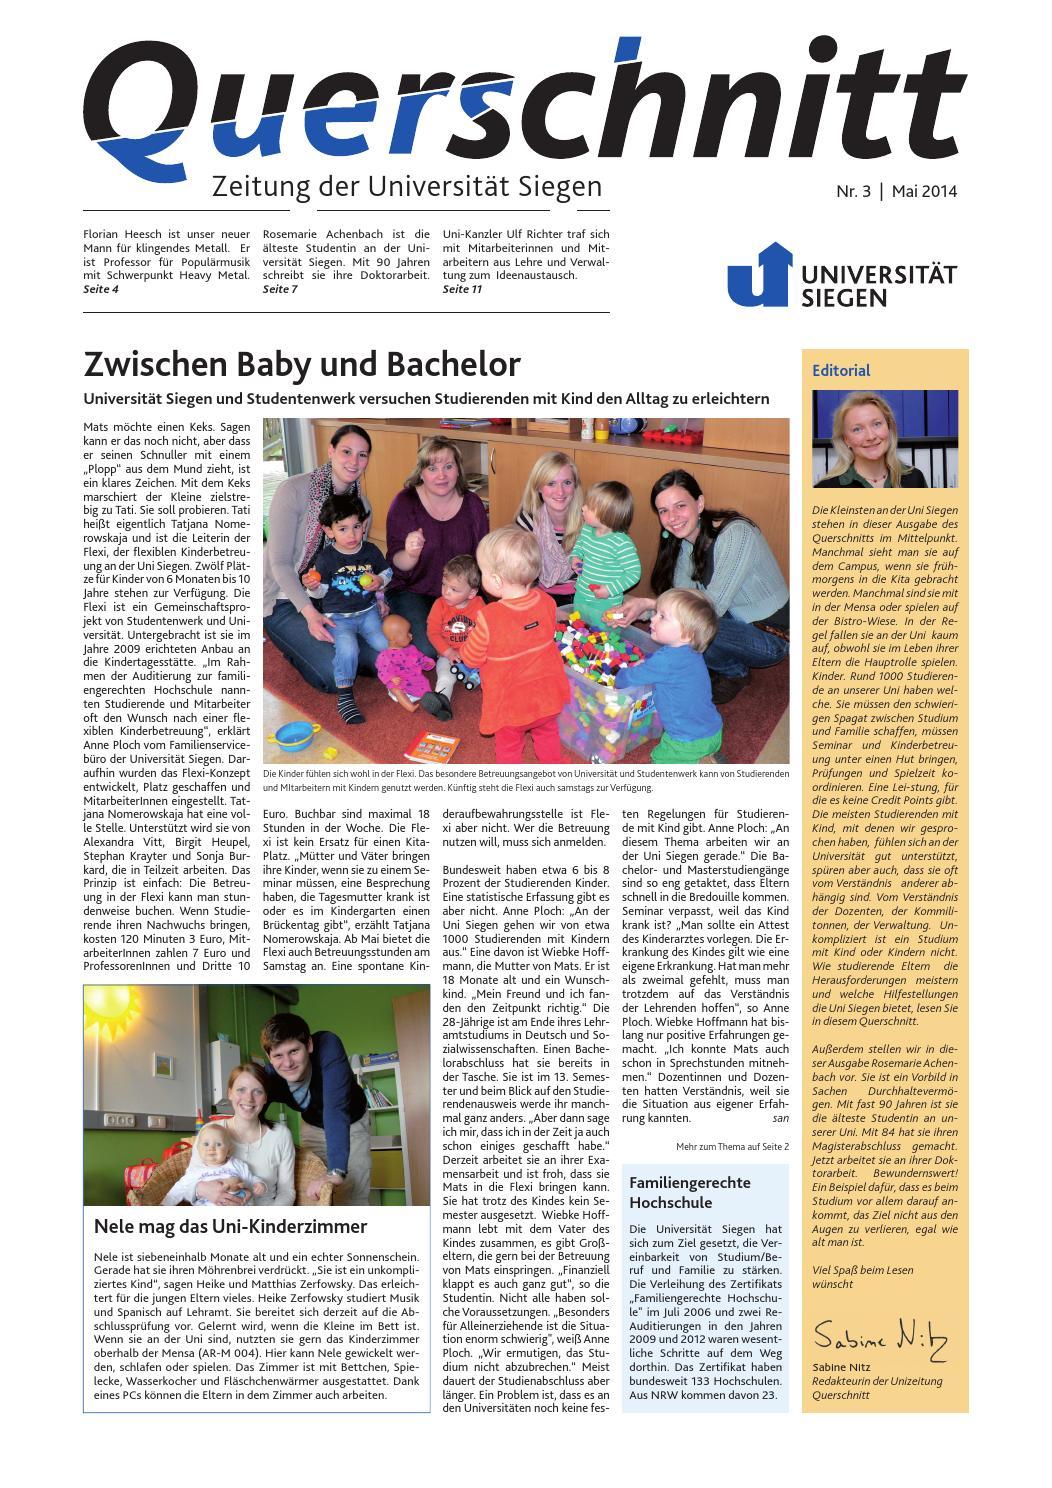 Querschnitt 3/2014 by Universität Siegen - issuu